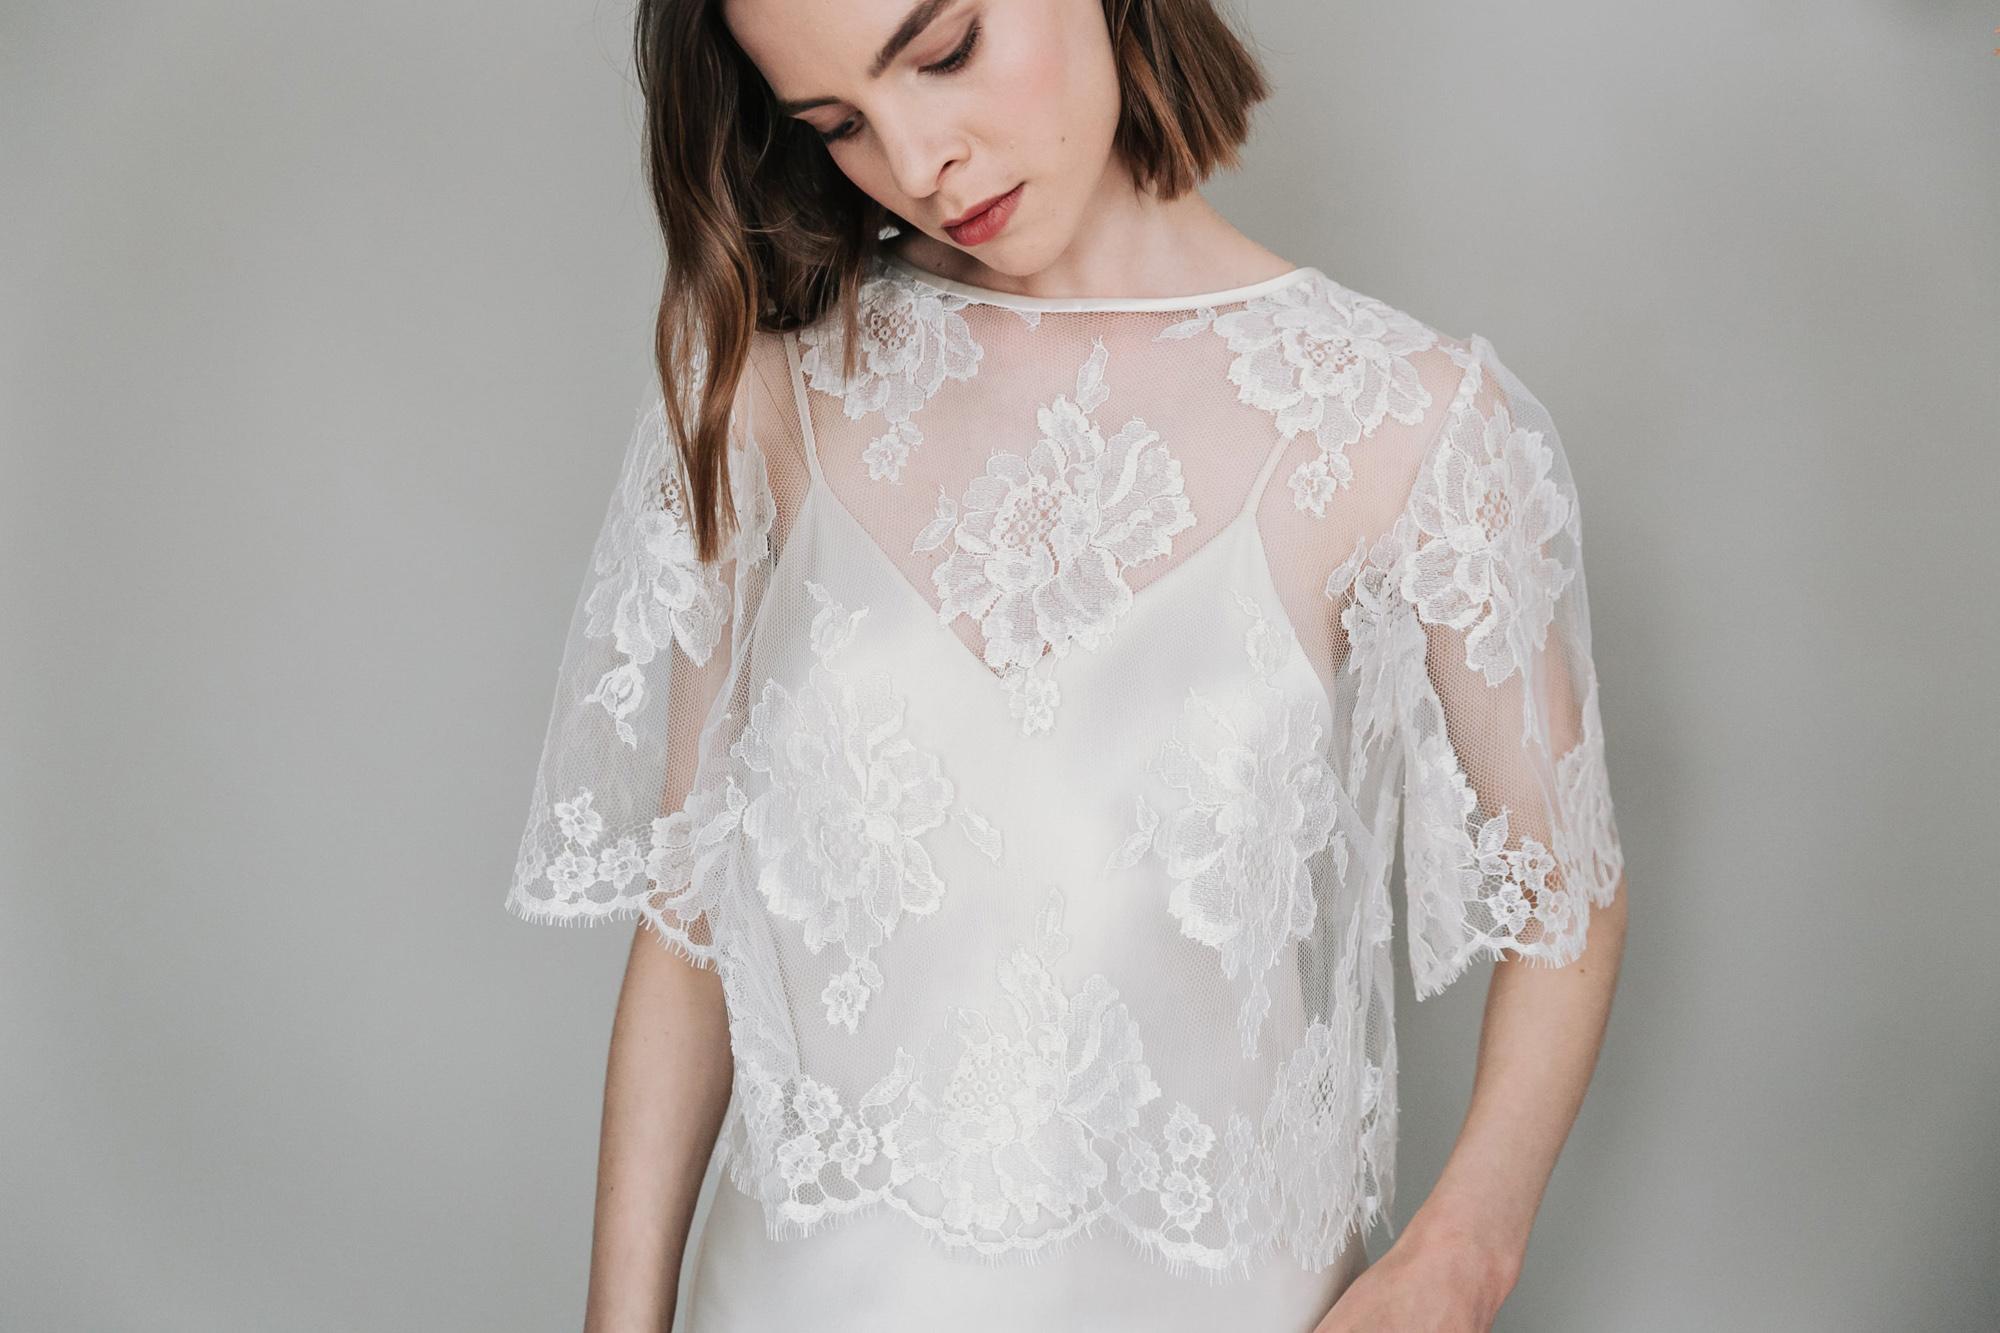 Kate-Beaumont-Sheffield-Rosa-Floral-Lace-Jacket-Camellia-Bias-Cut-Silk-Wedding-Gown-4.jpg